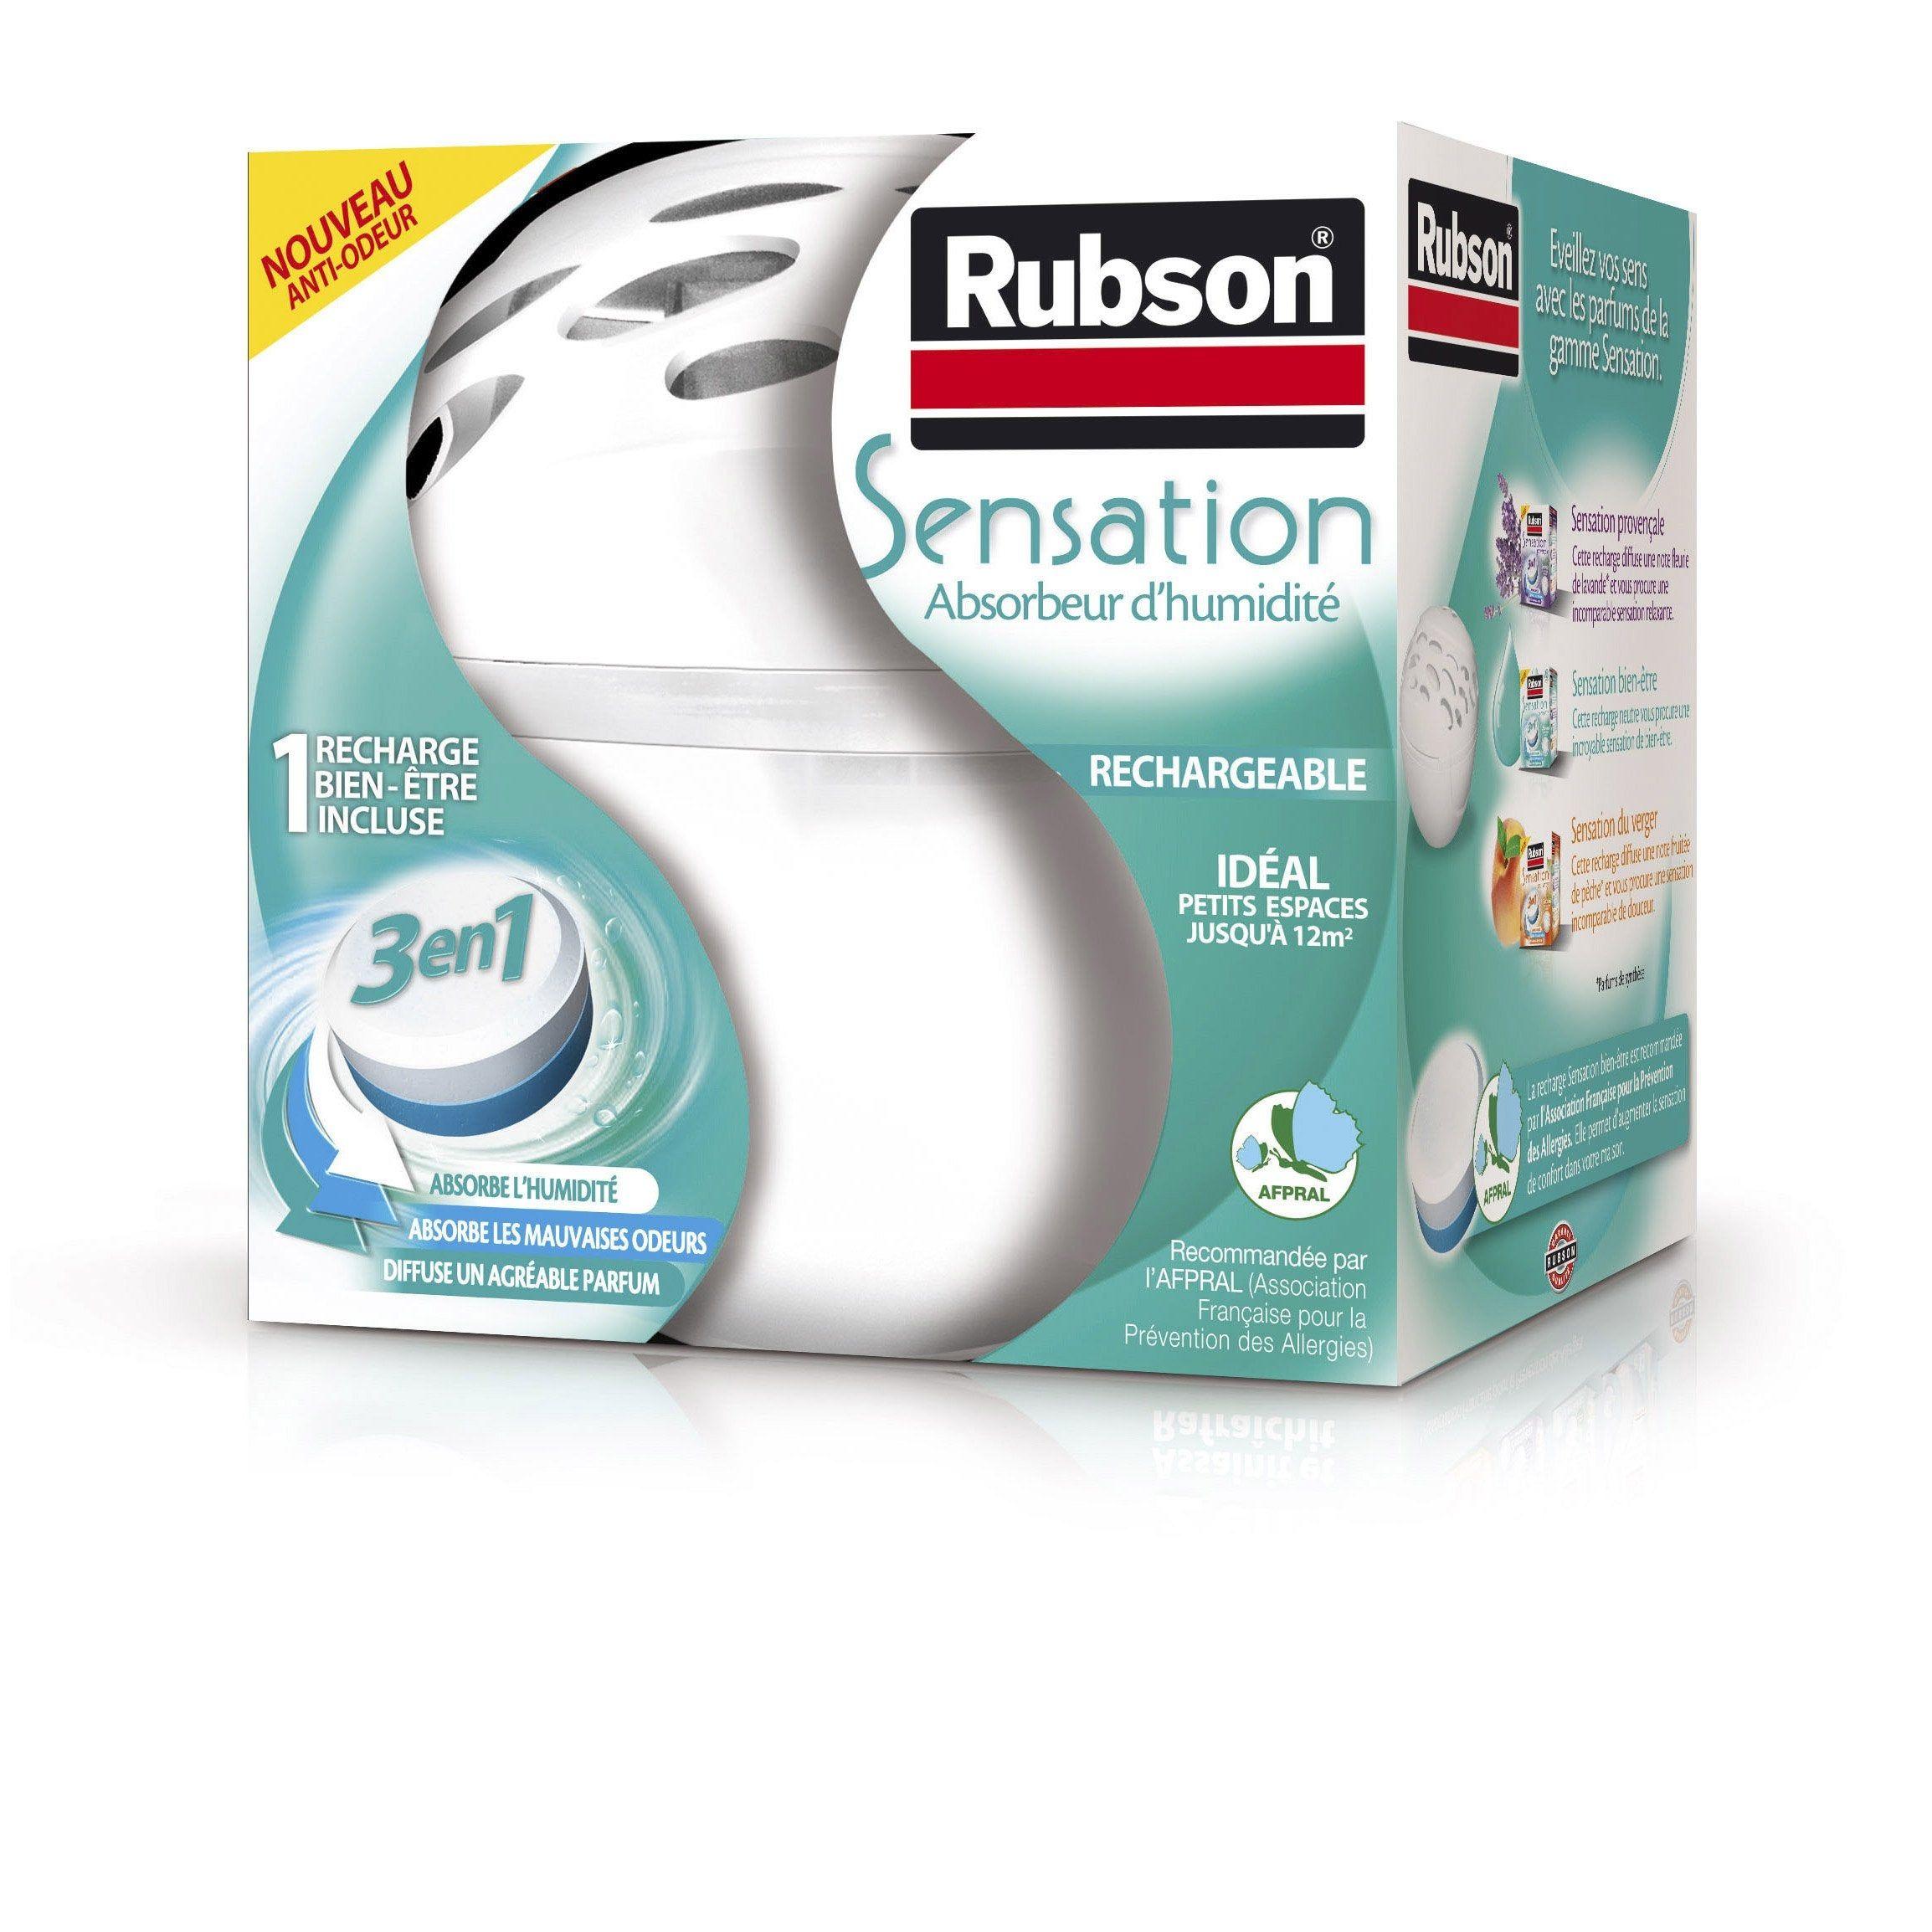 Rubson 3 En 1 Absorbeur D Humidite Avec Une Recharge 12 M Absorbeur D Humidite Castorama Mauvaise Odeur